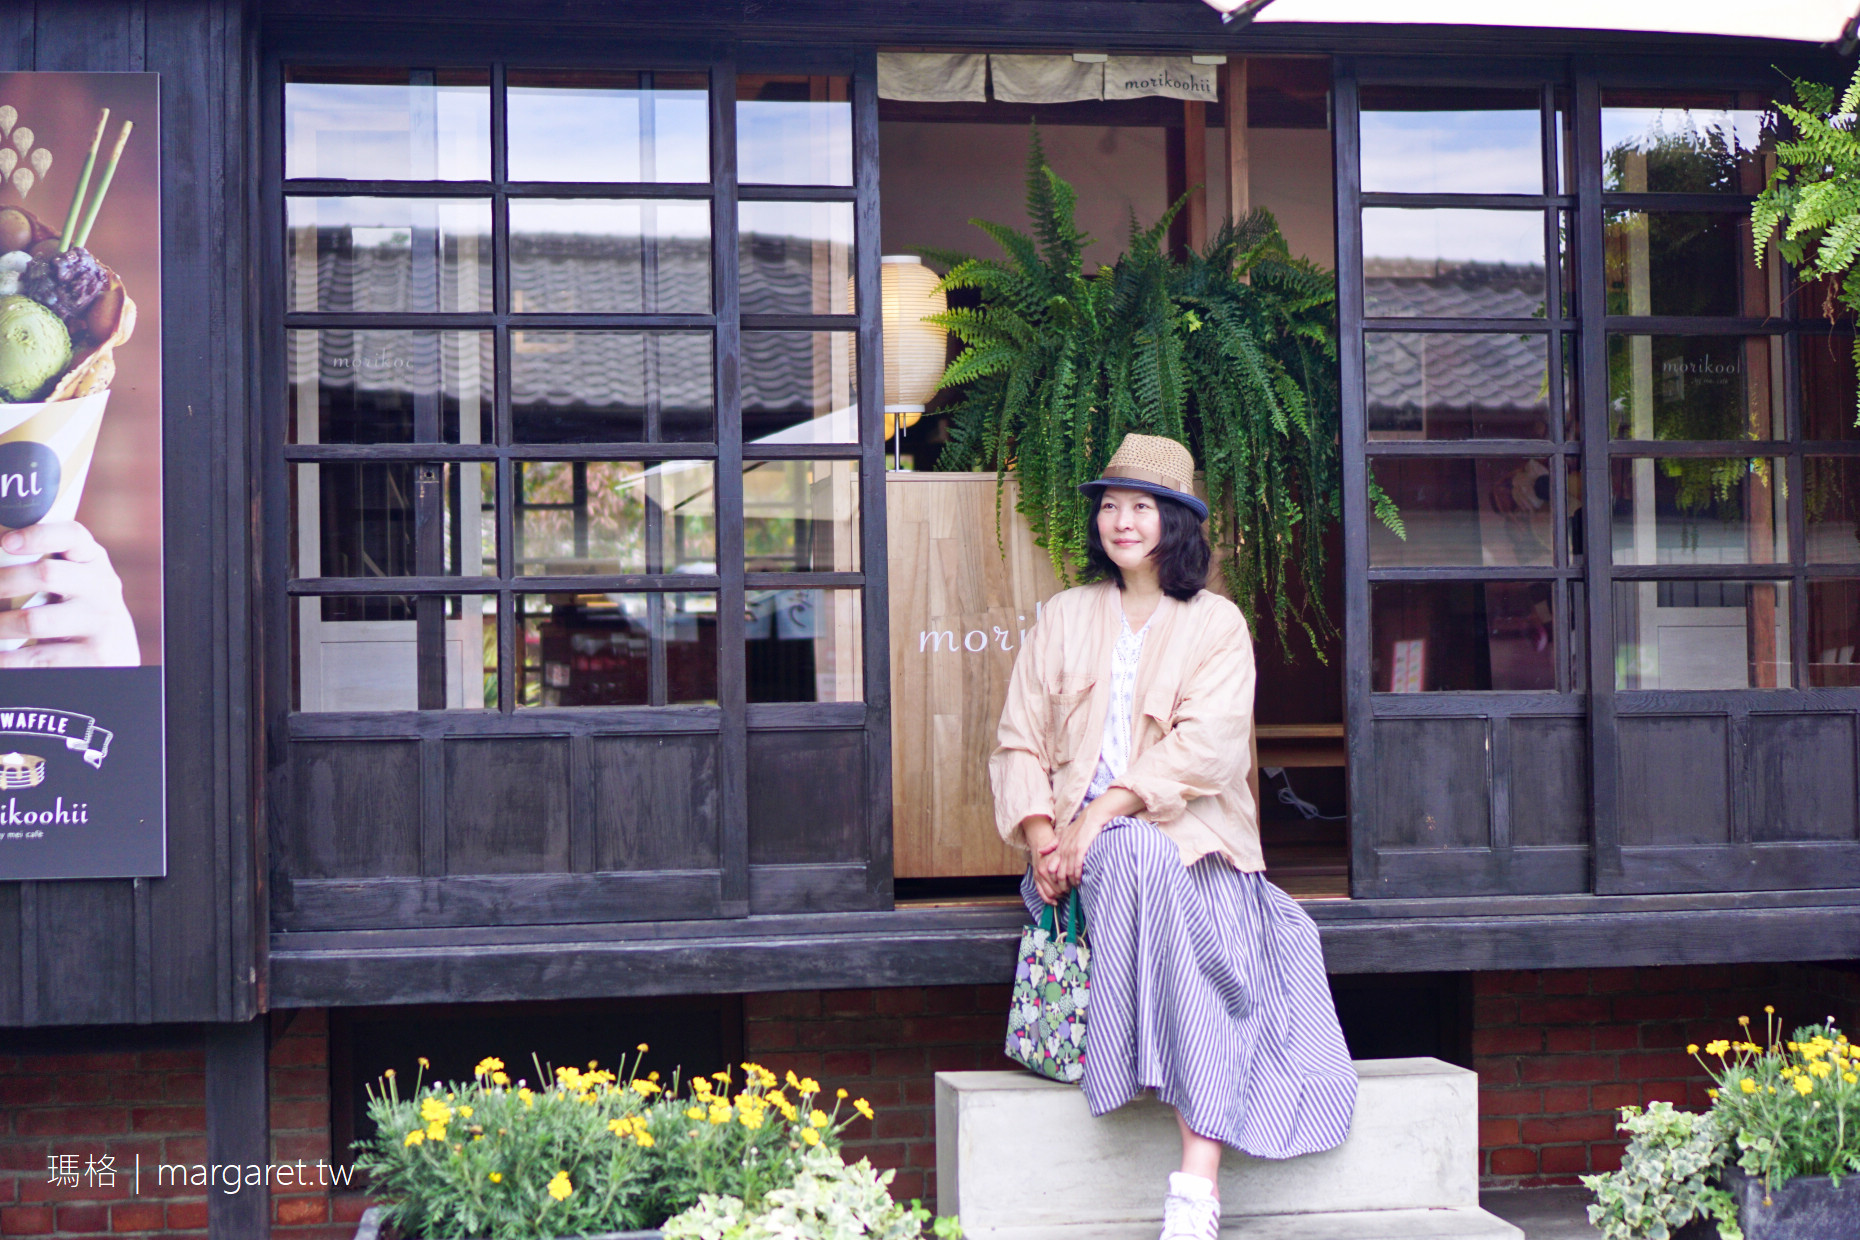 Morikoohii Ni。嘉義森咖啡貳店|港式雞蛋仔 x 日式喫茶店 @瑪格。圖寫生活